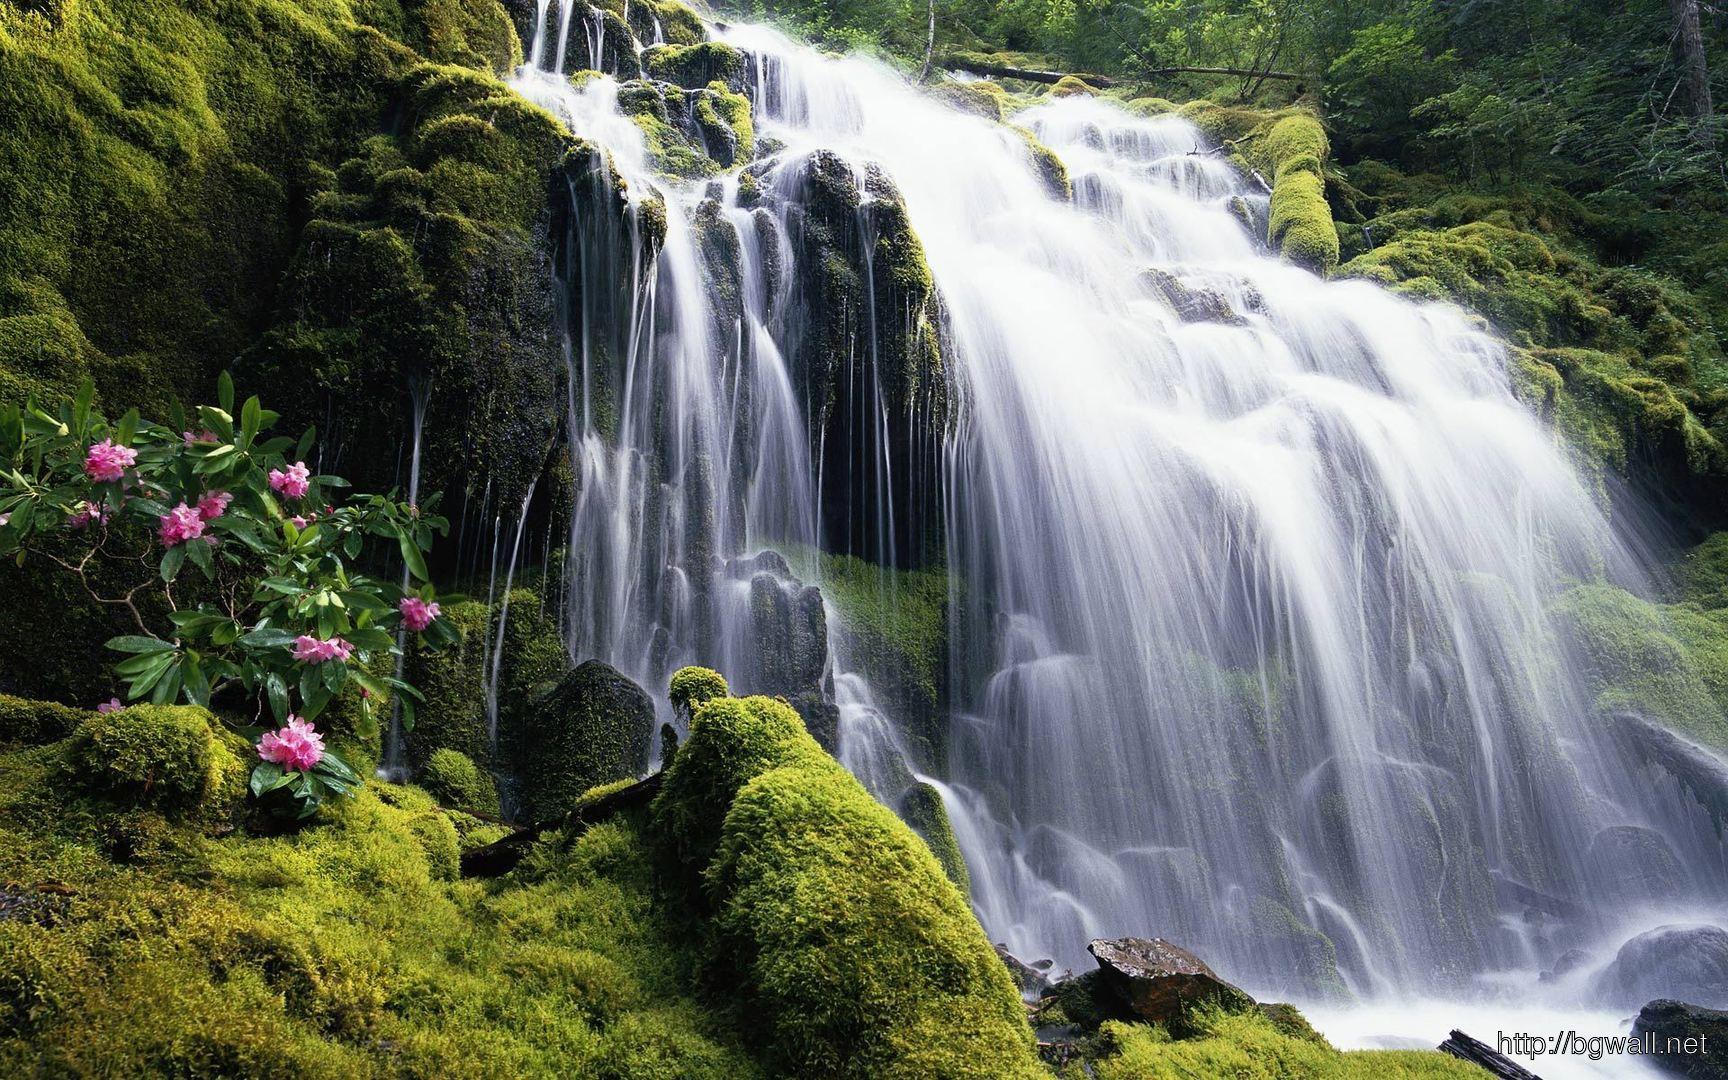 Waterfall wallpaper 1154 background wallpaper hd waterfall wallpaper 1154 voltagebd Gallery